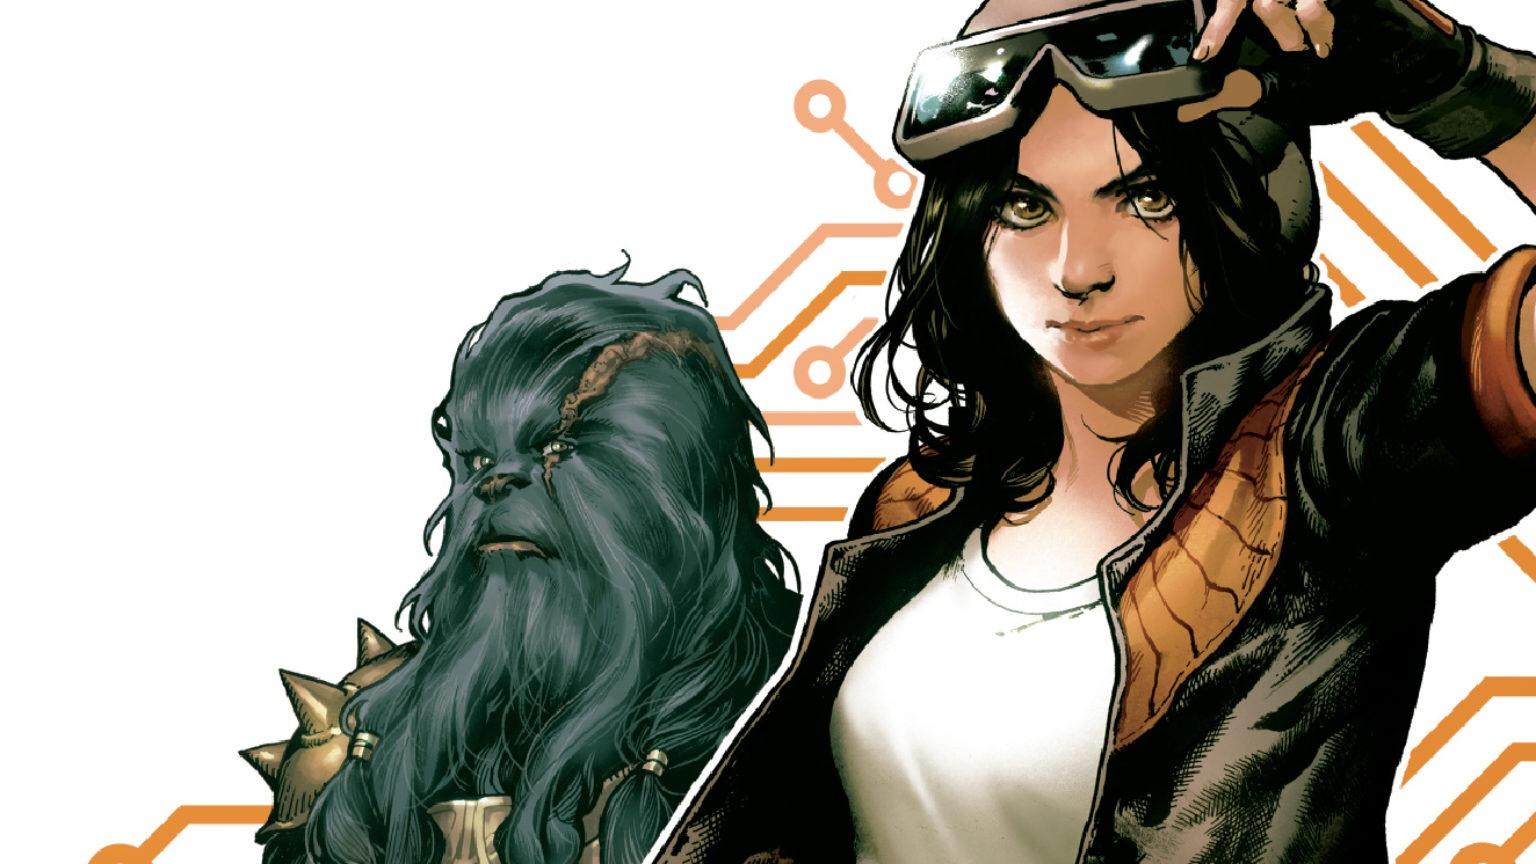 Star Wars: Doctor Aphra #1 - Cover SNIP